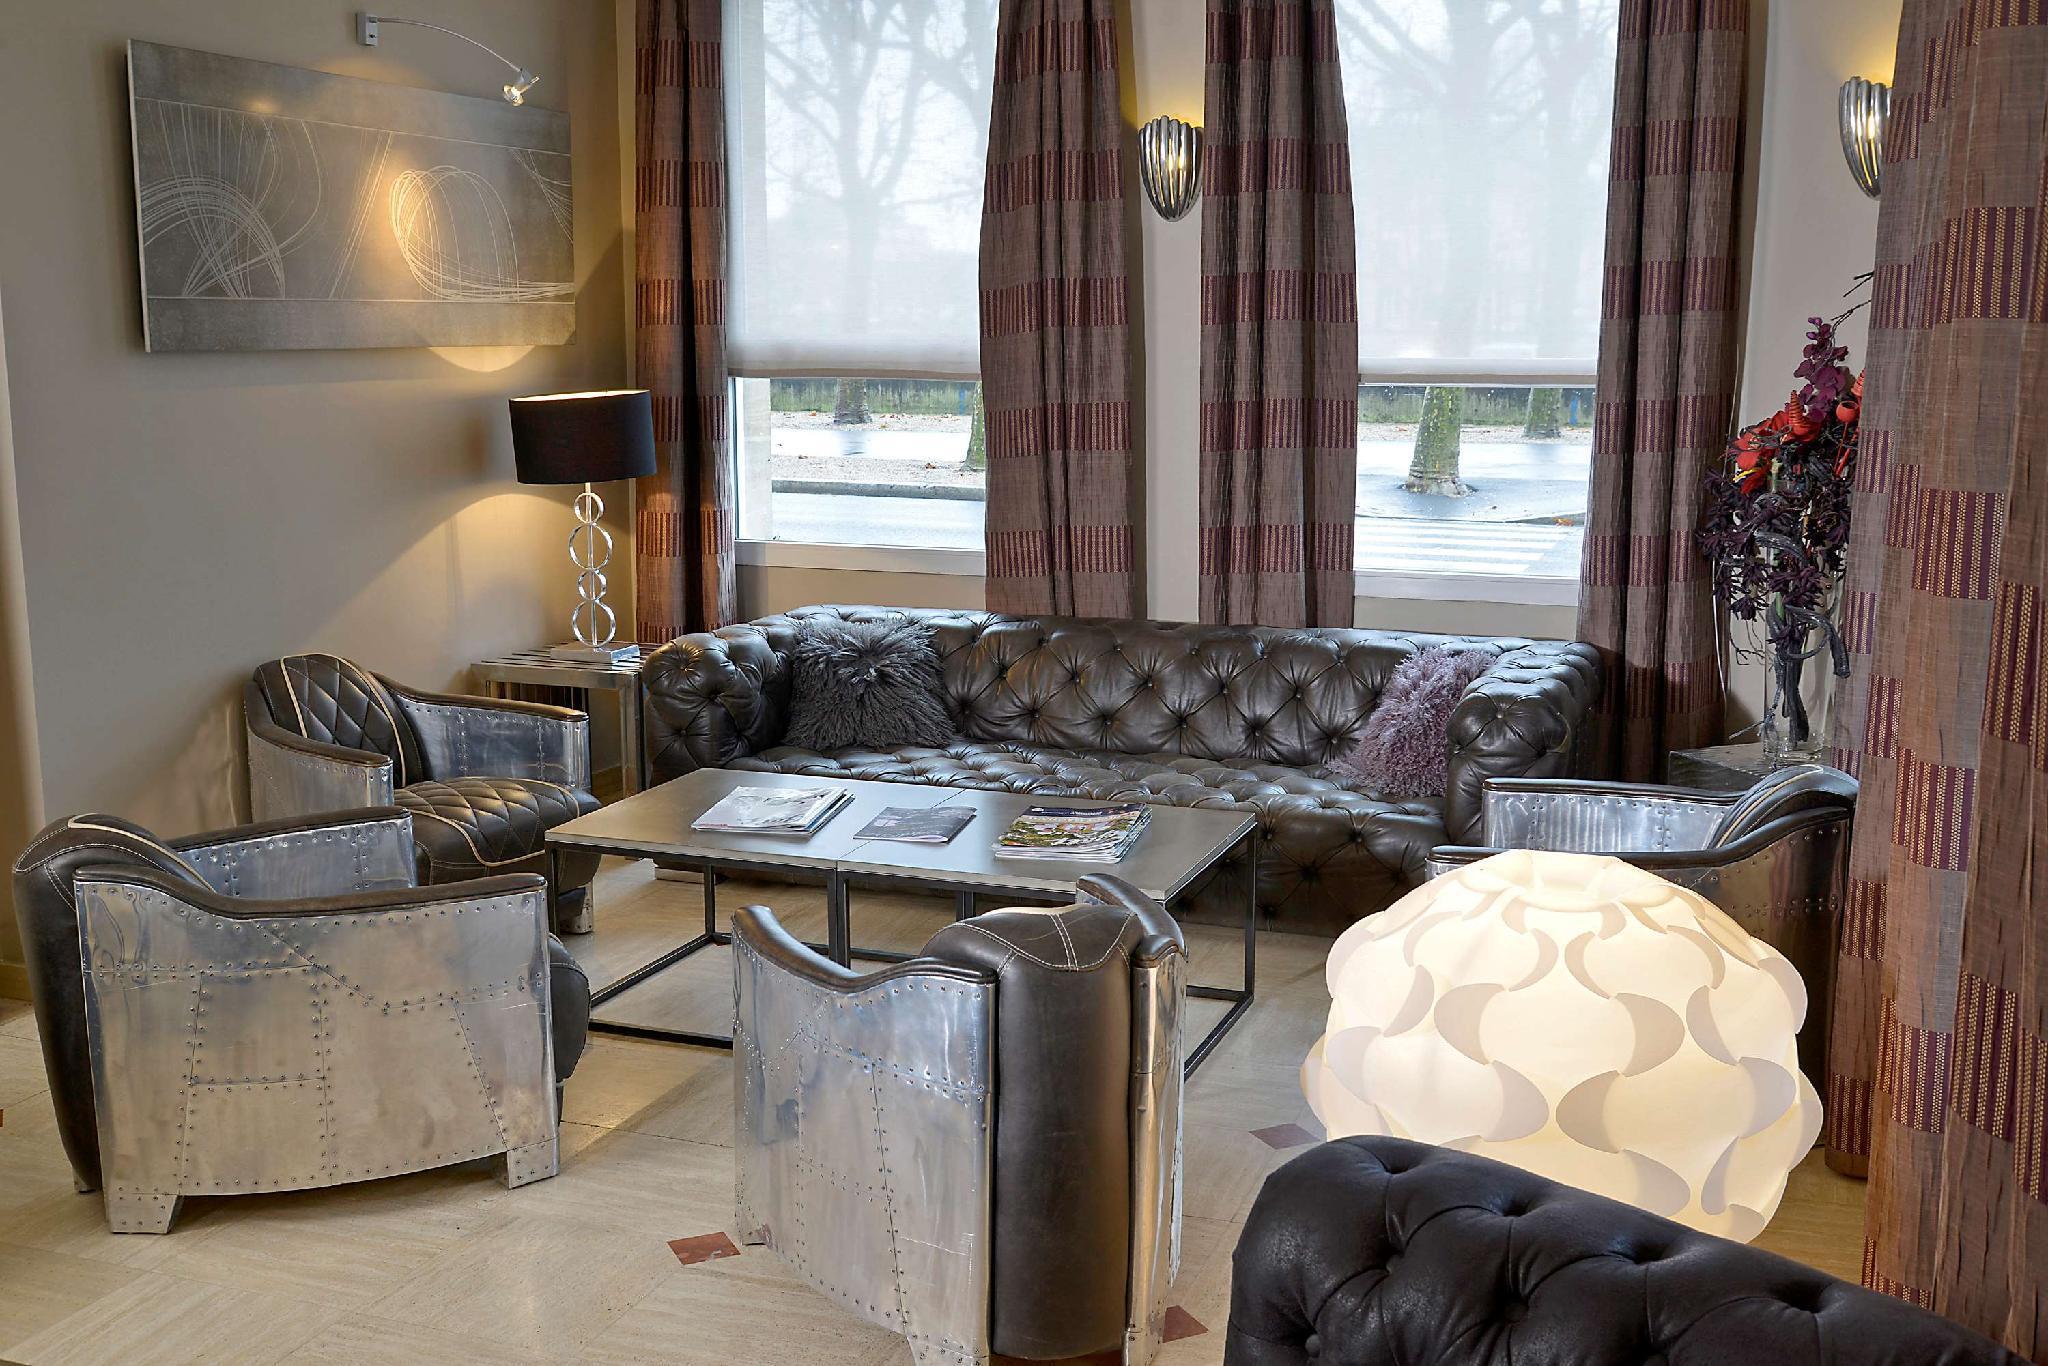 Best Western Hotel Les Beaux Arts